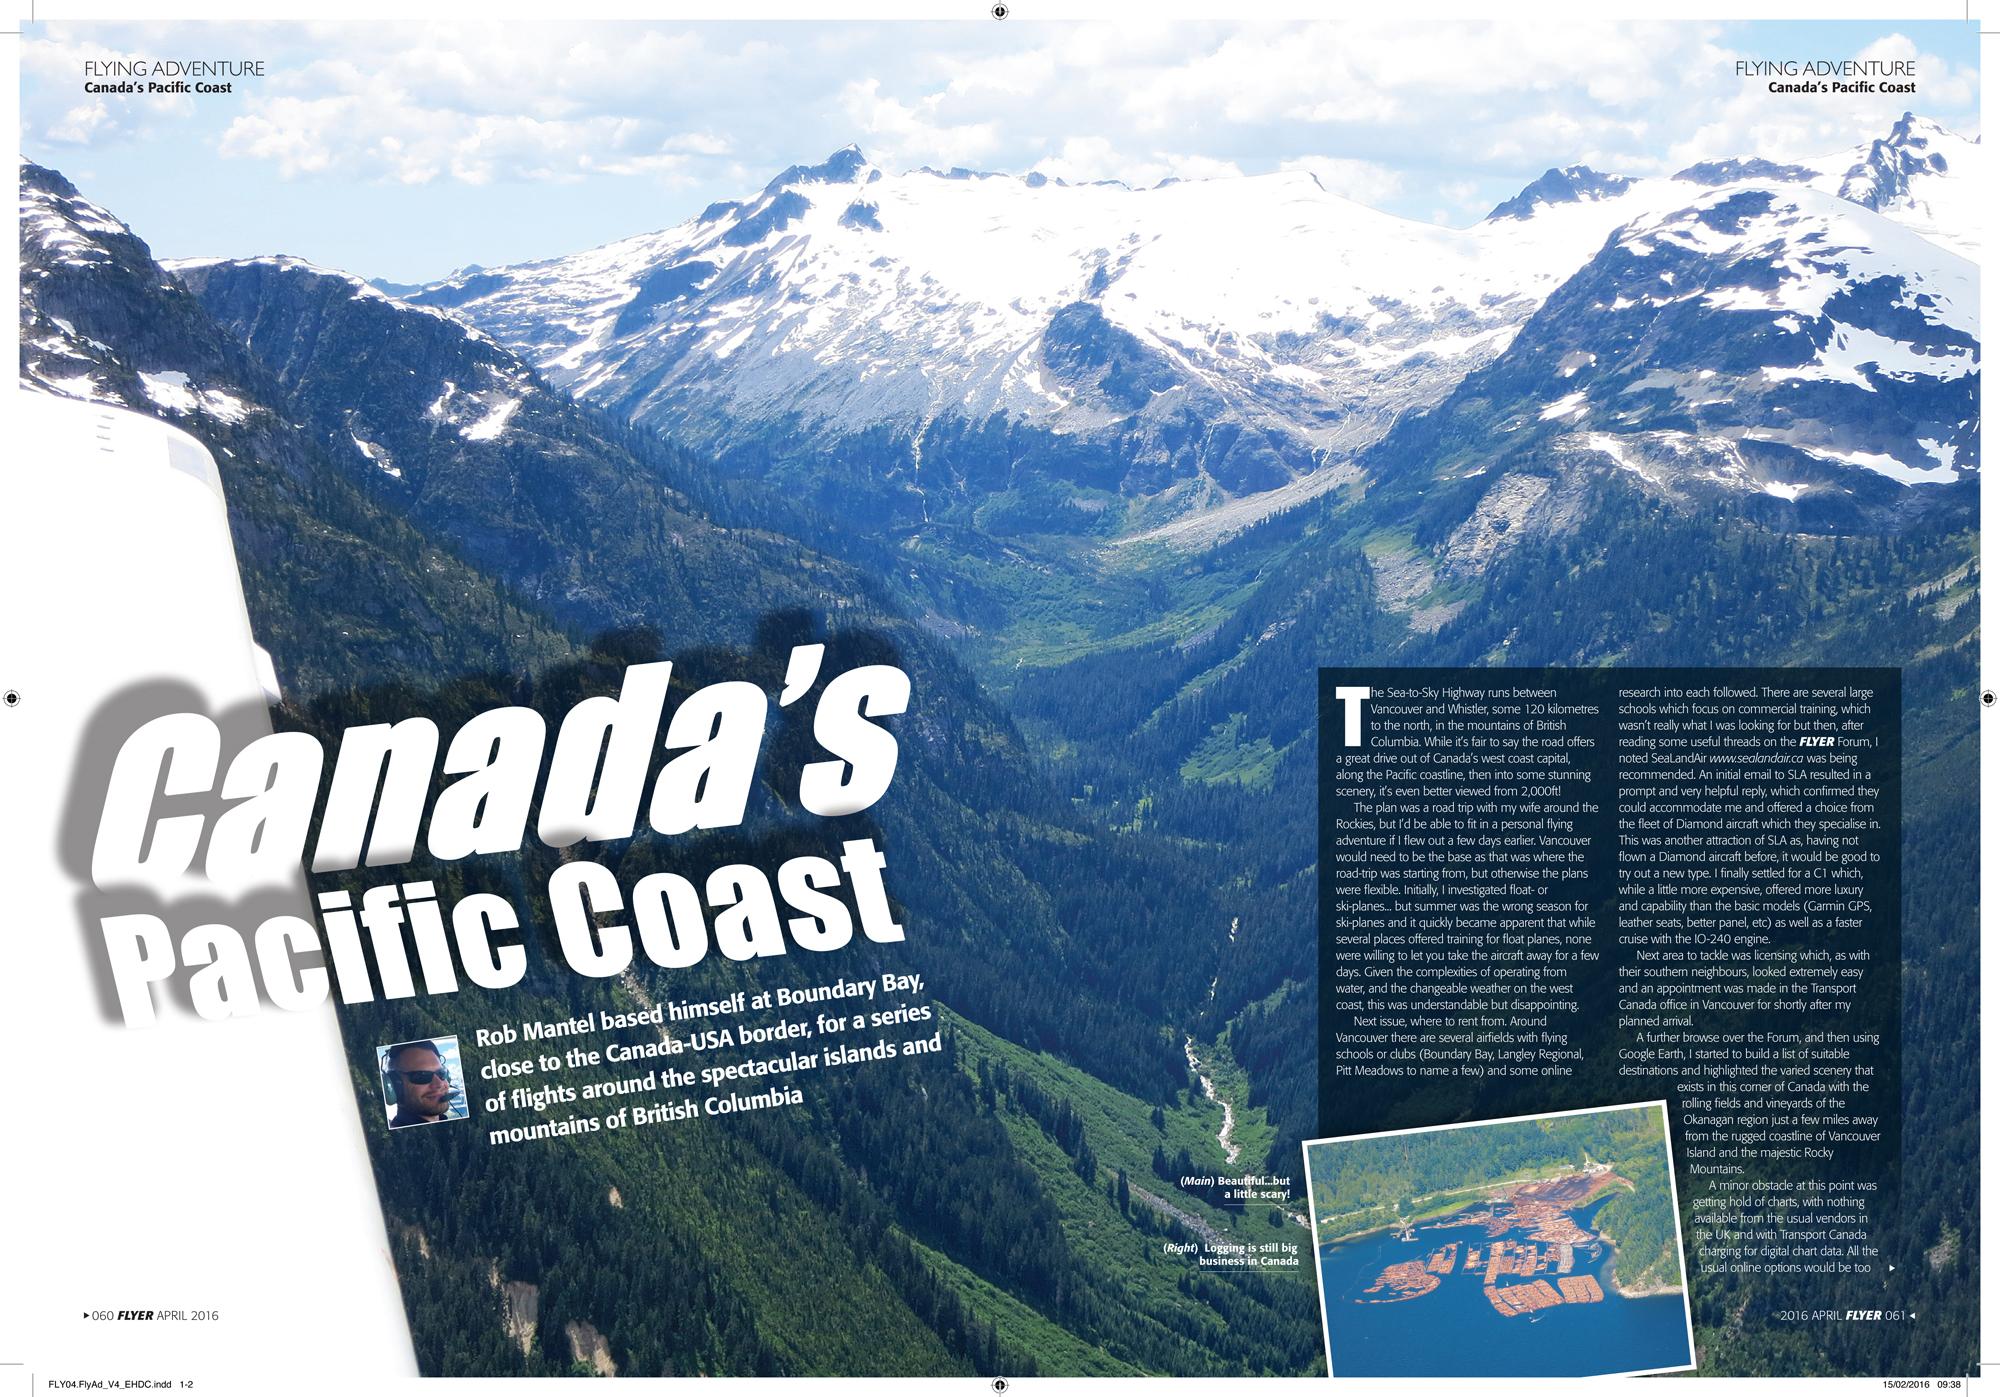 Flying Adventure in western Canada